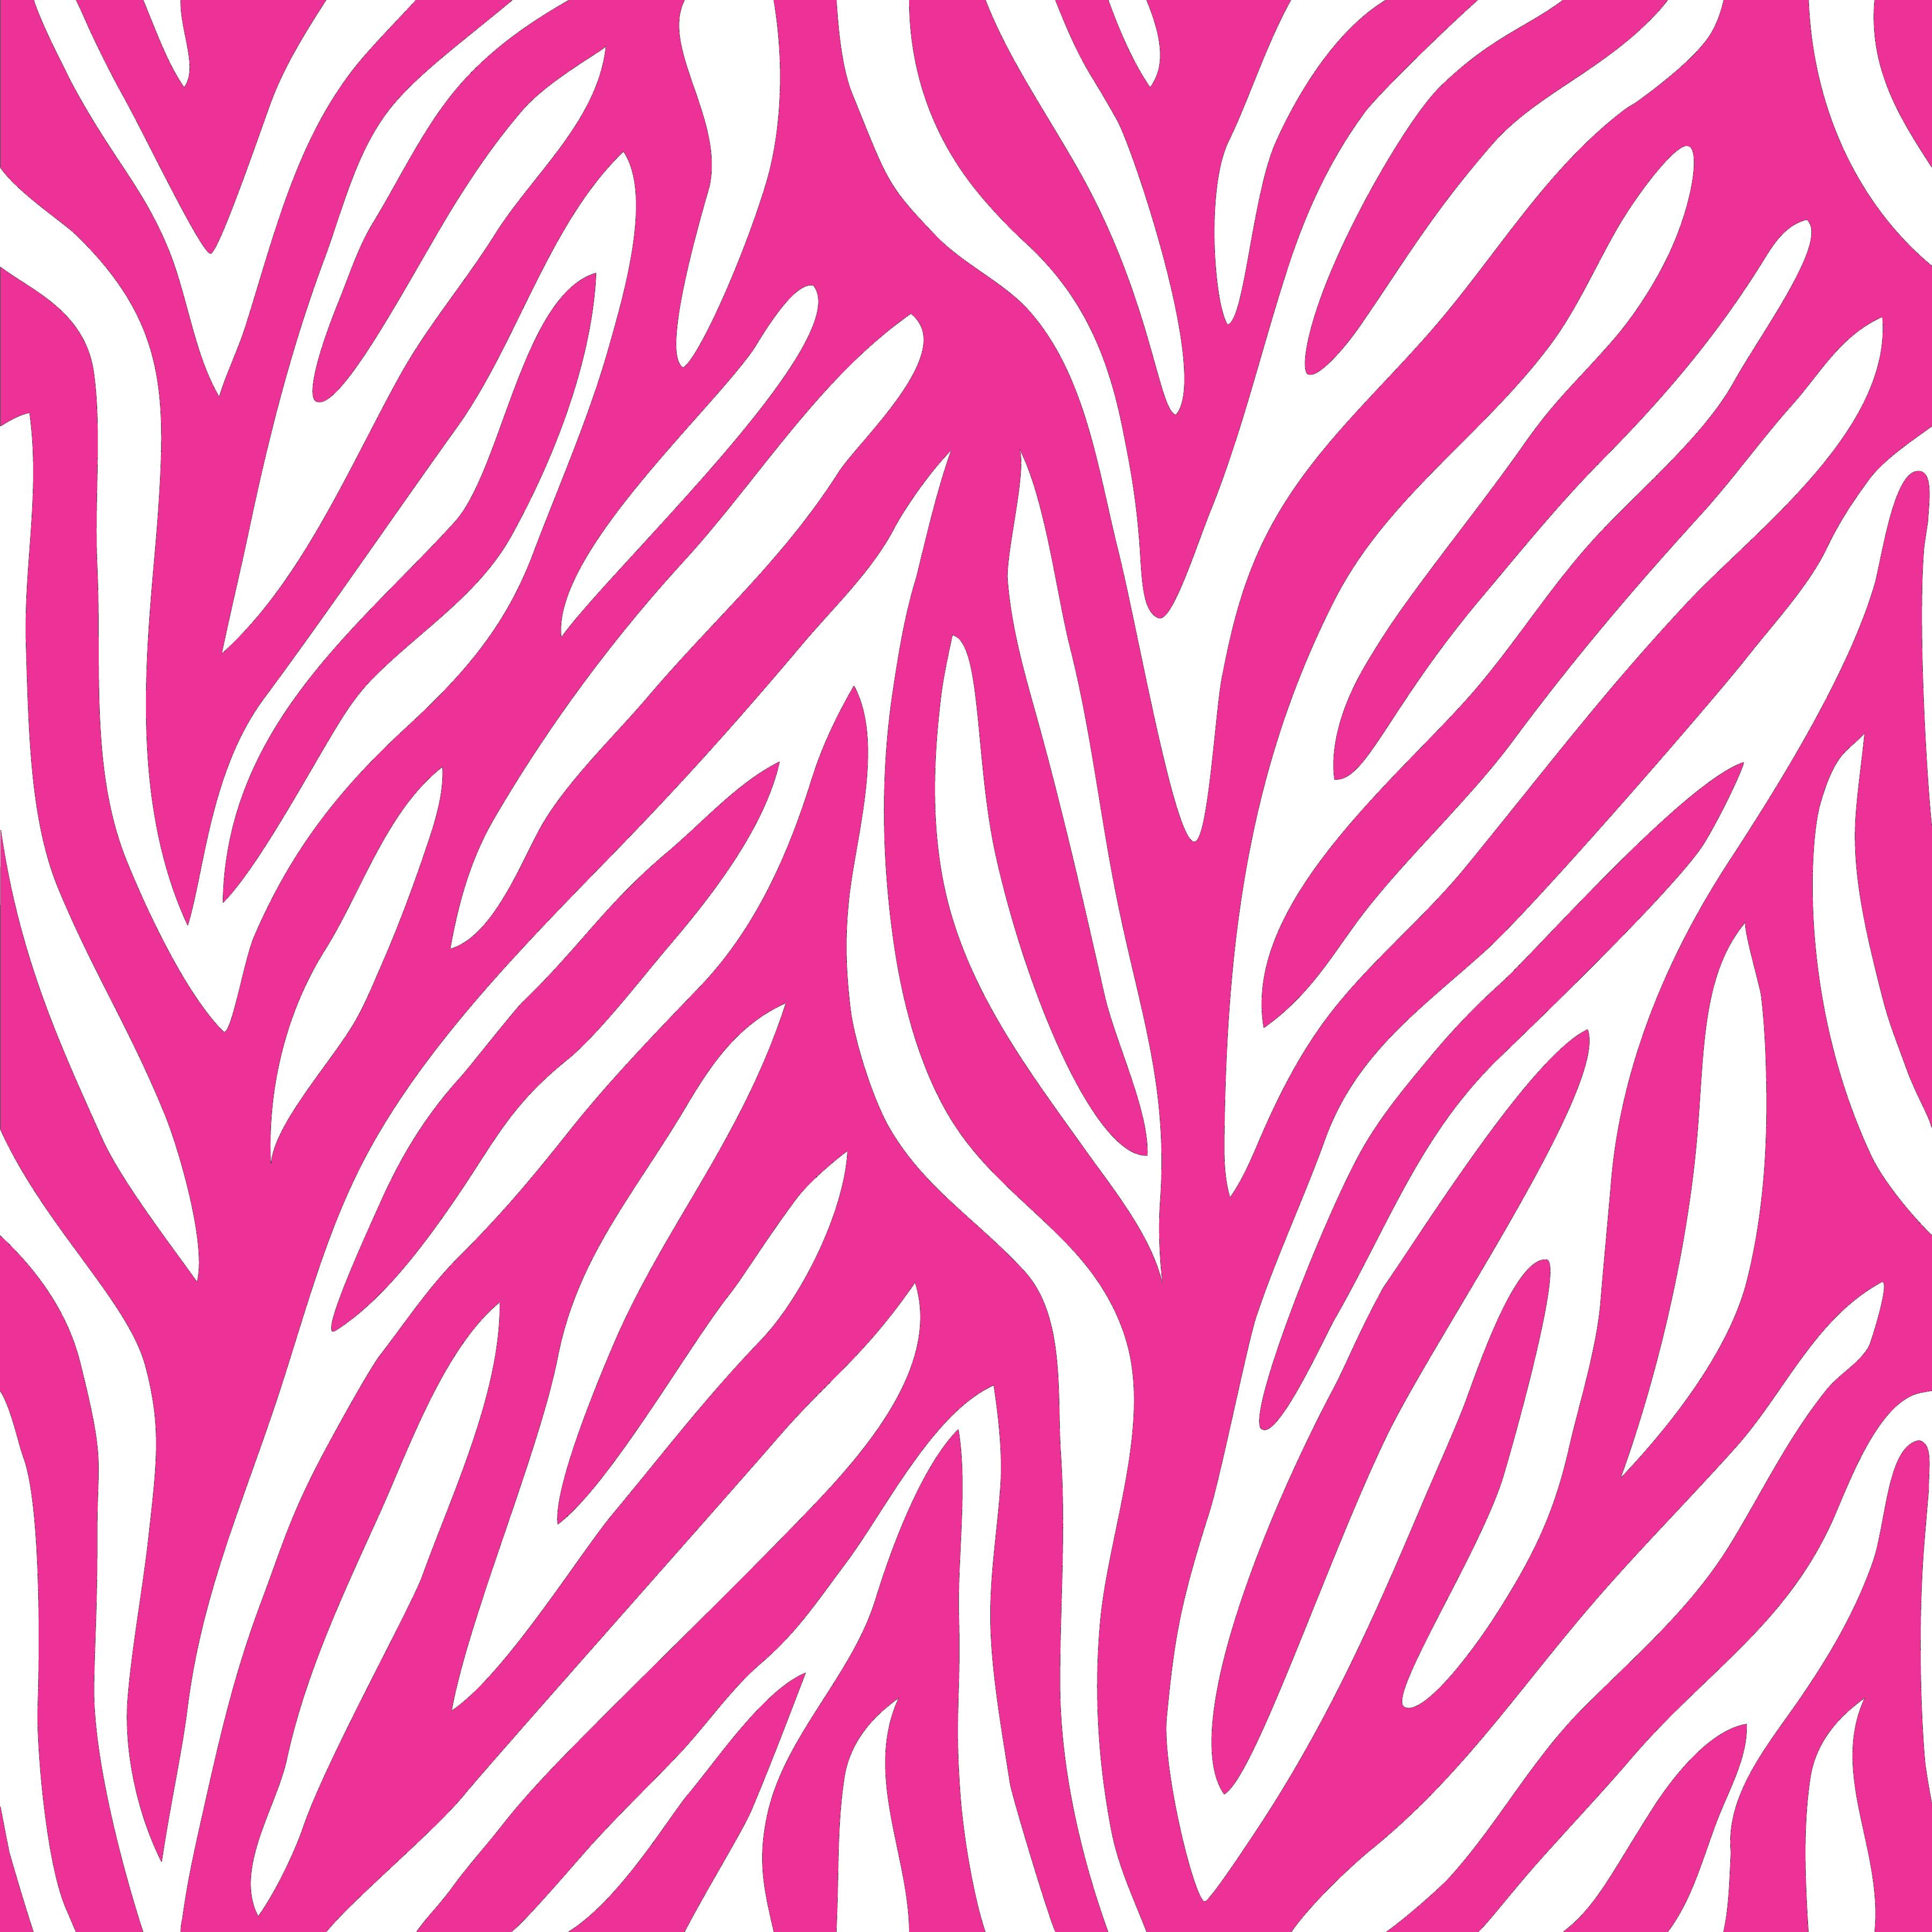 Drawing Of Pink Zebra Background Free Image Download